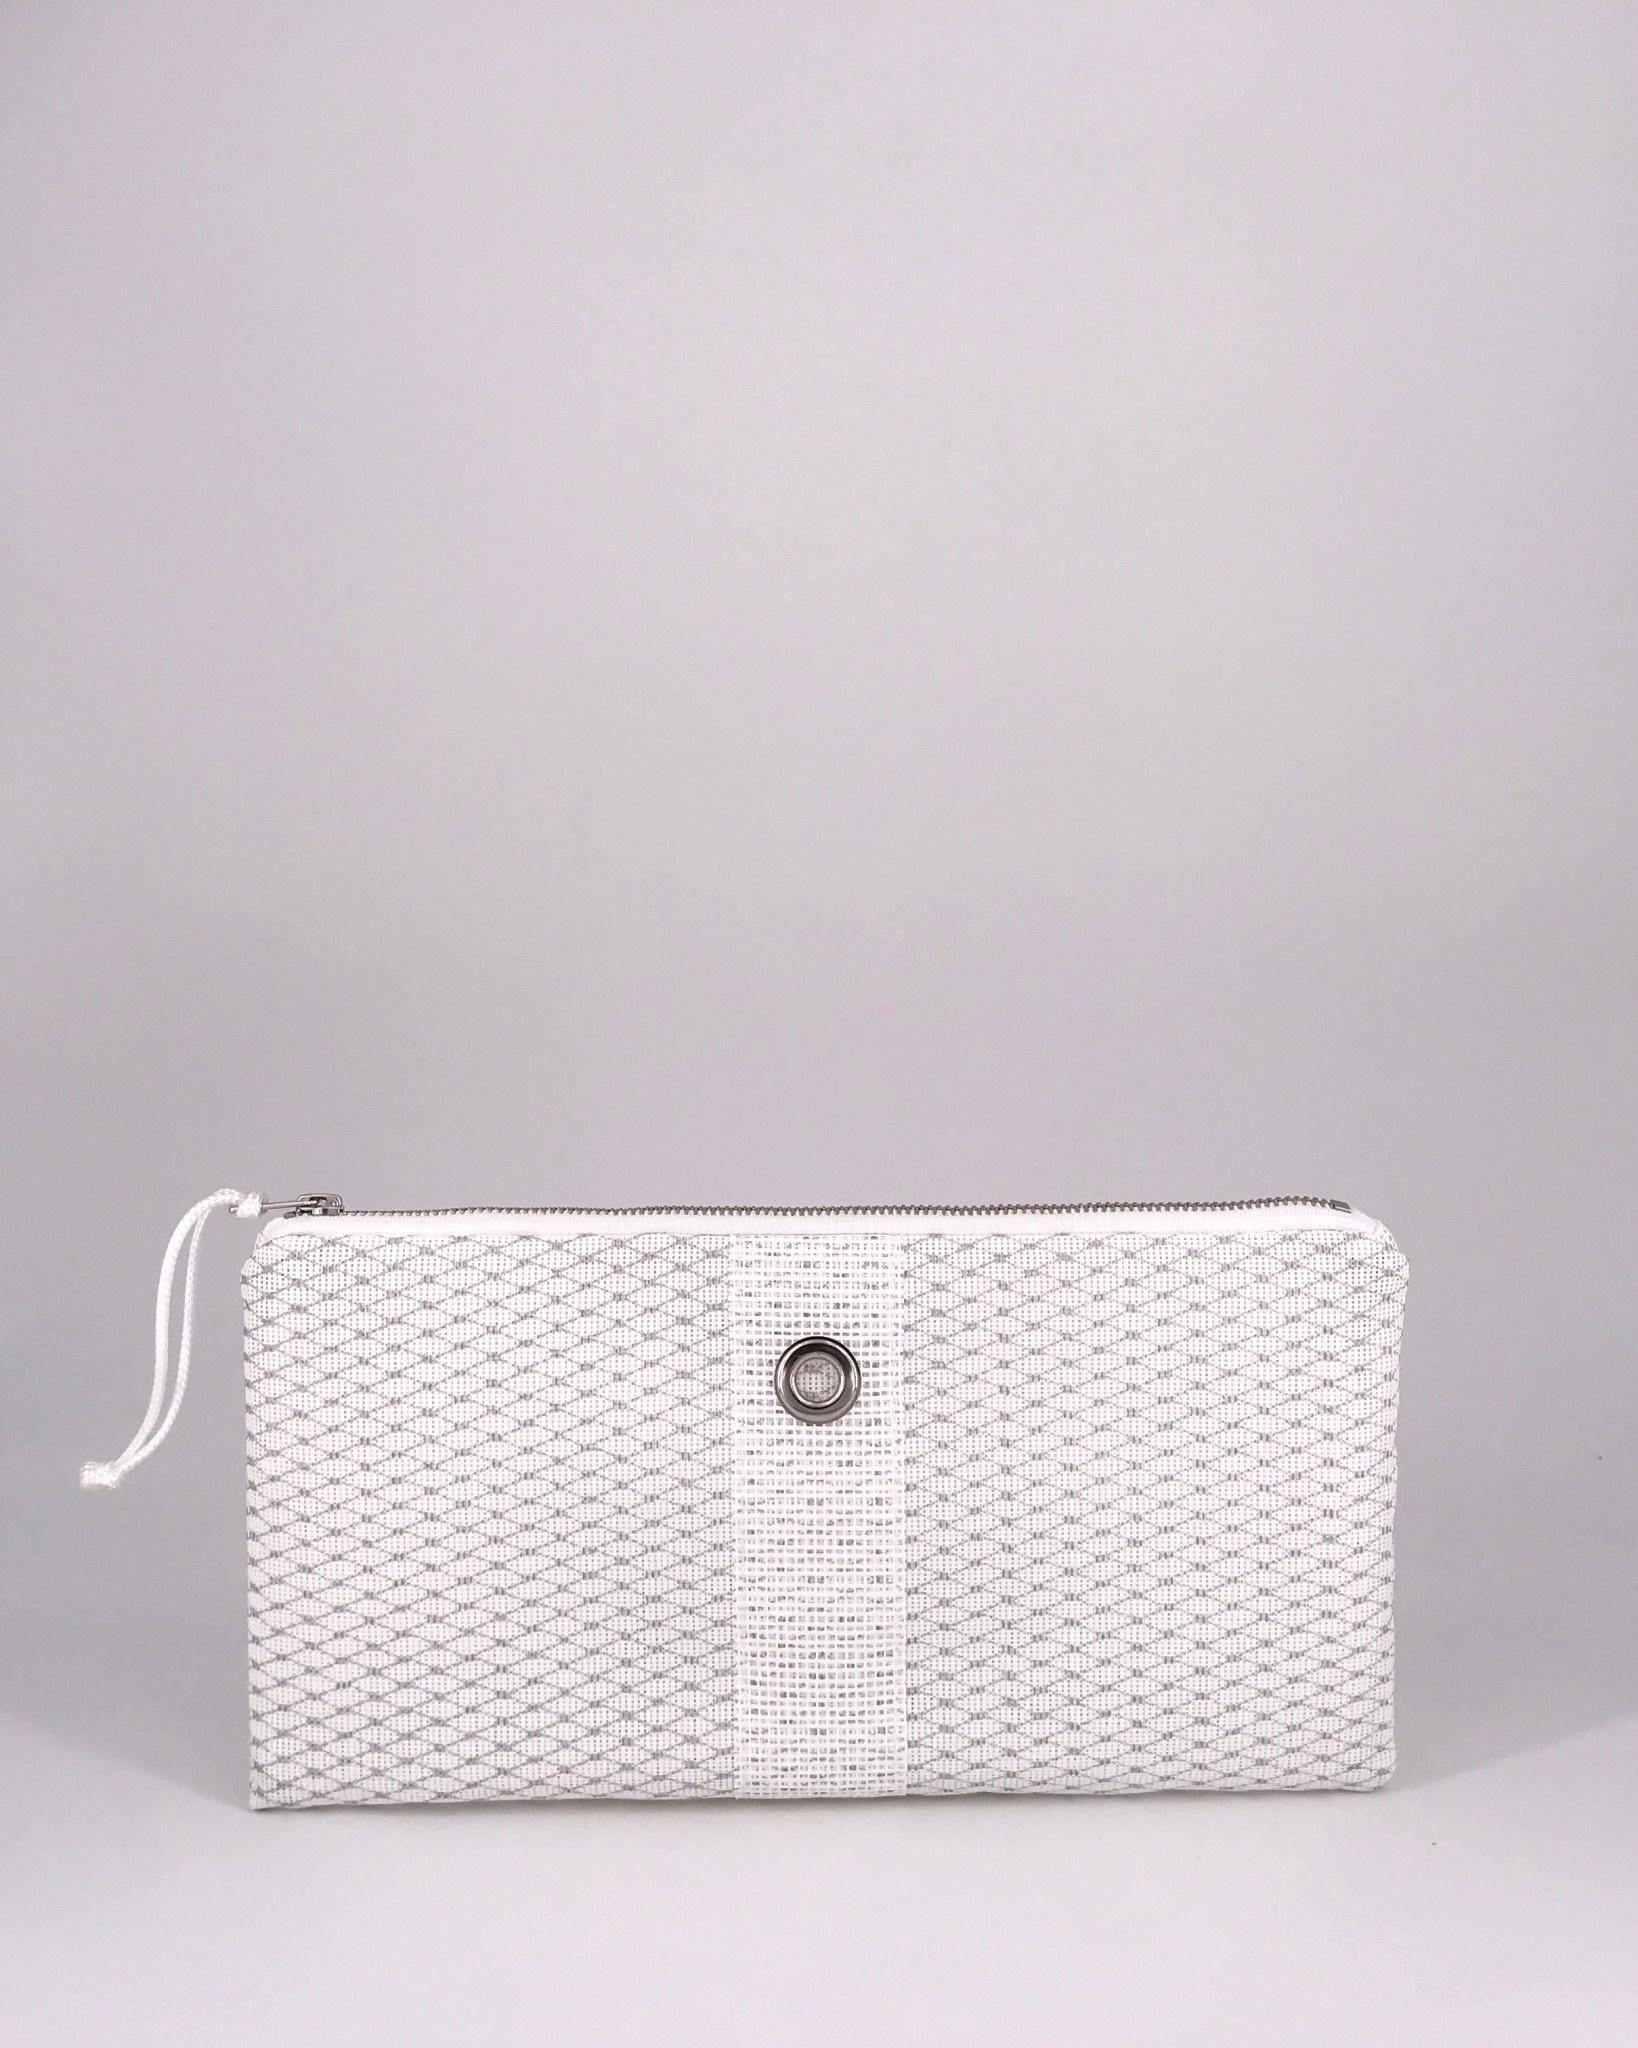 56b528ab584 Alaina Marie ® Mini Silver on White & White Clutch